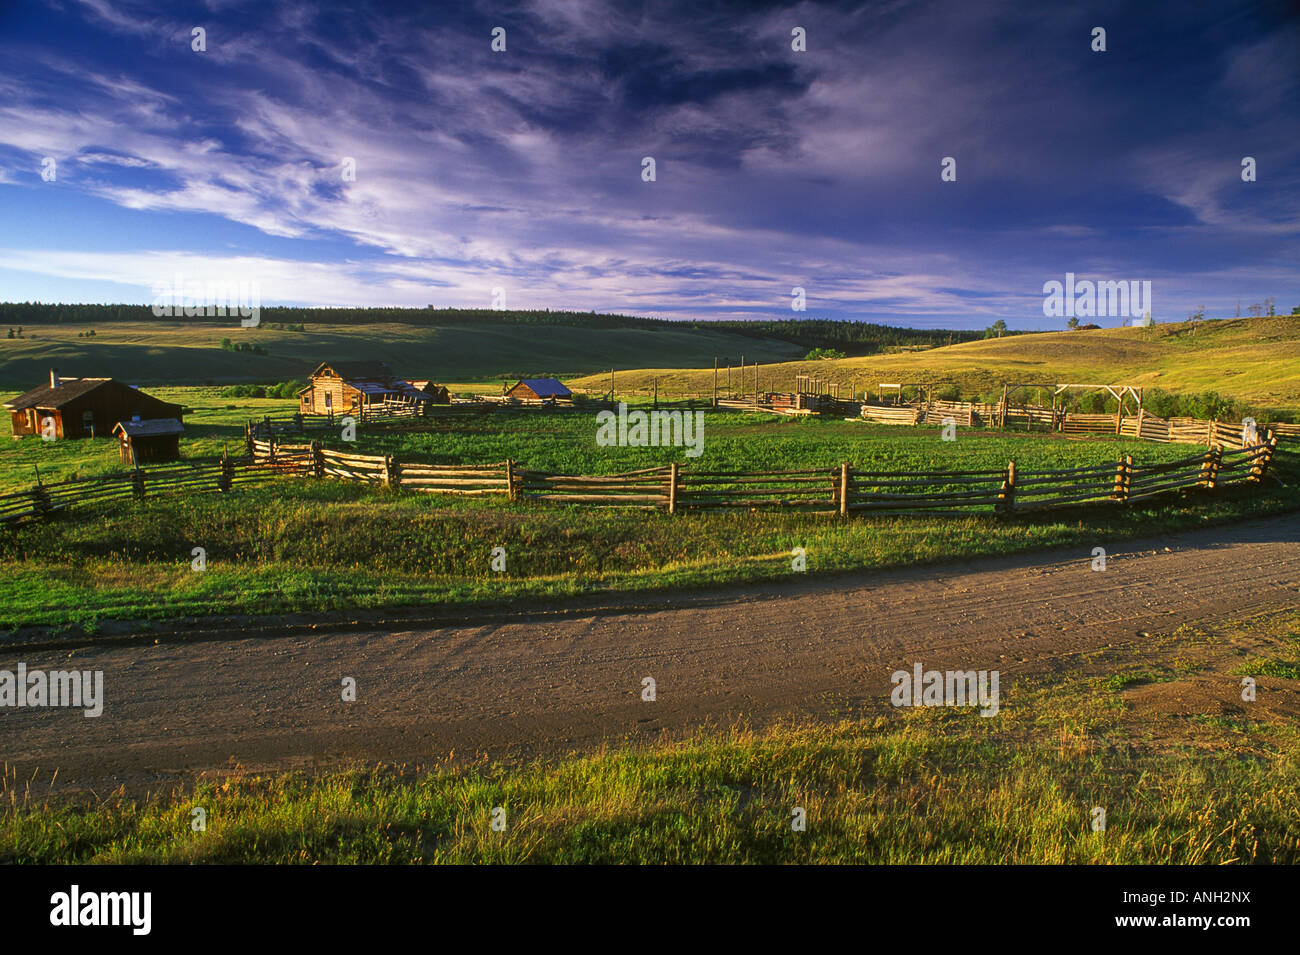 Corral and old homestead near Dog Creek, British Columbia, Canada. - Stock Image